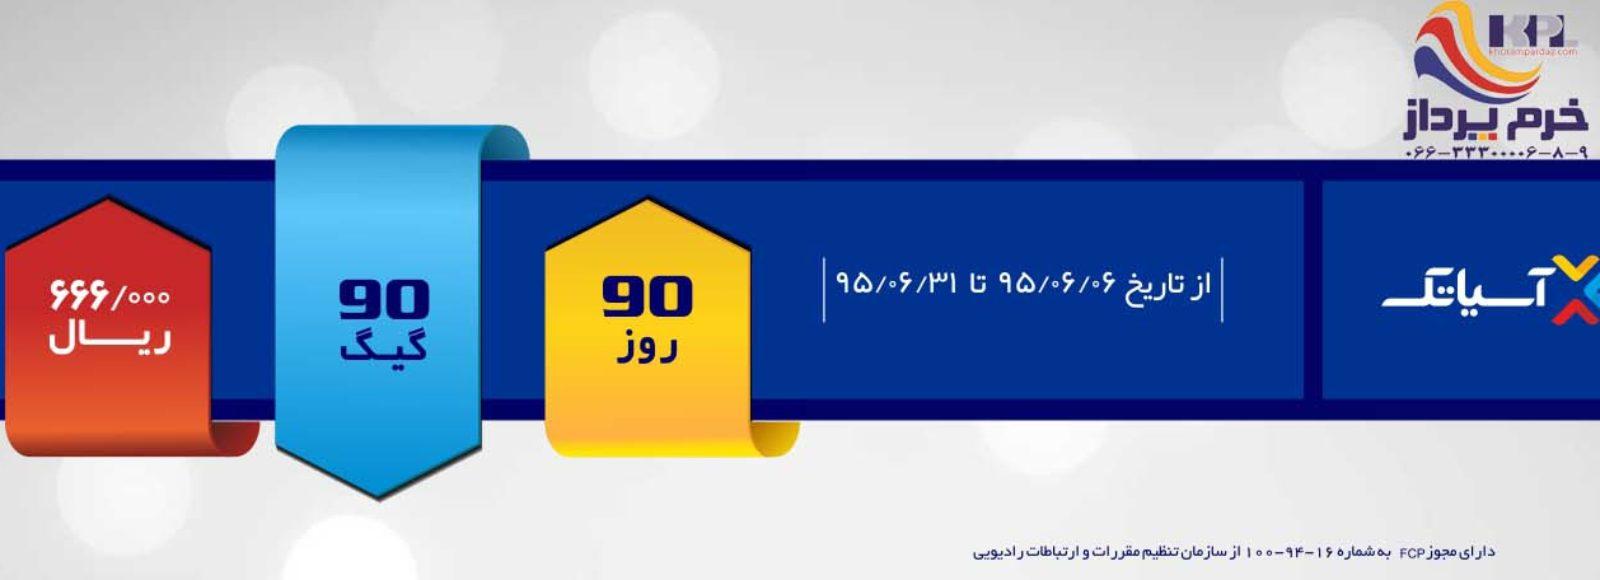 گیگ باکس ۹۰ گیگ ۹۰ روز